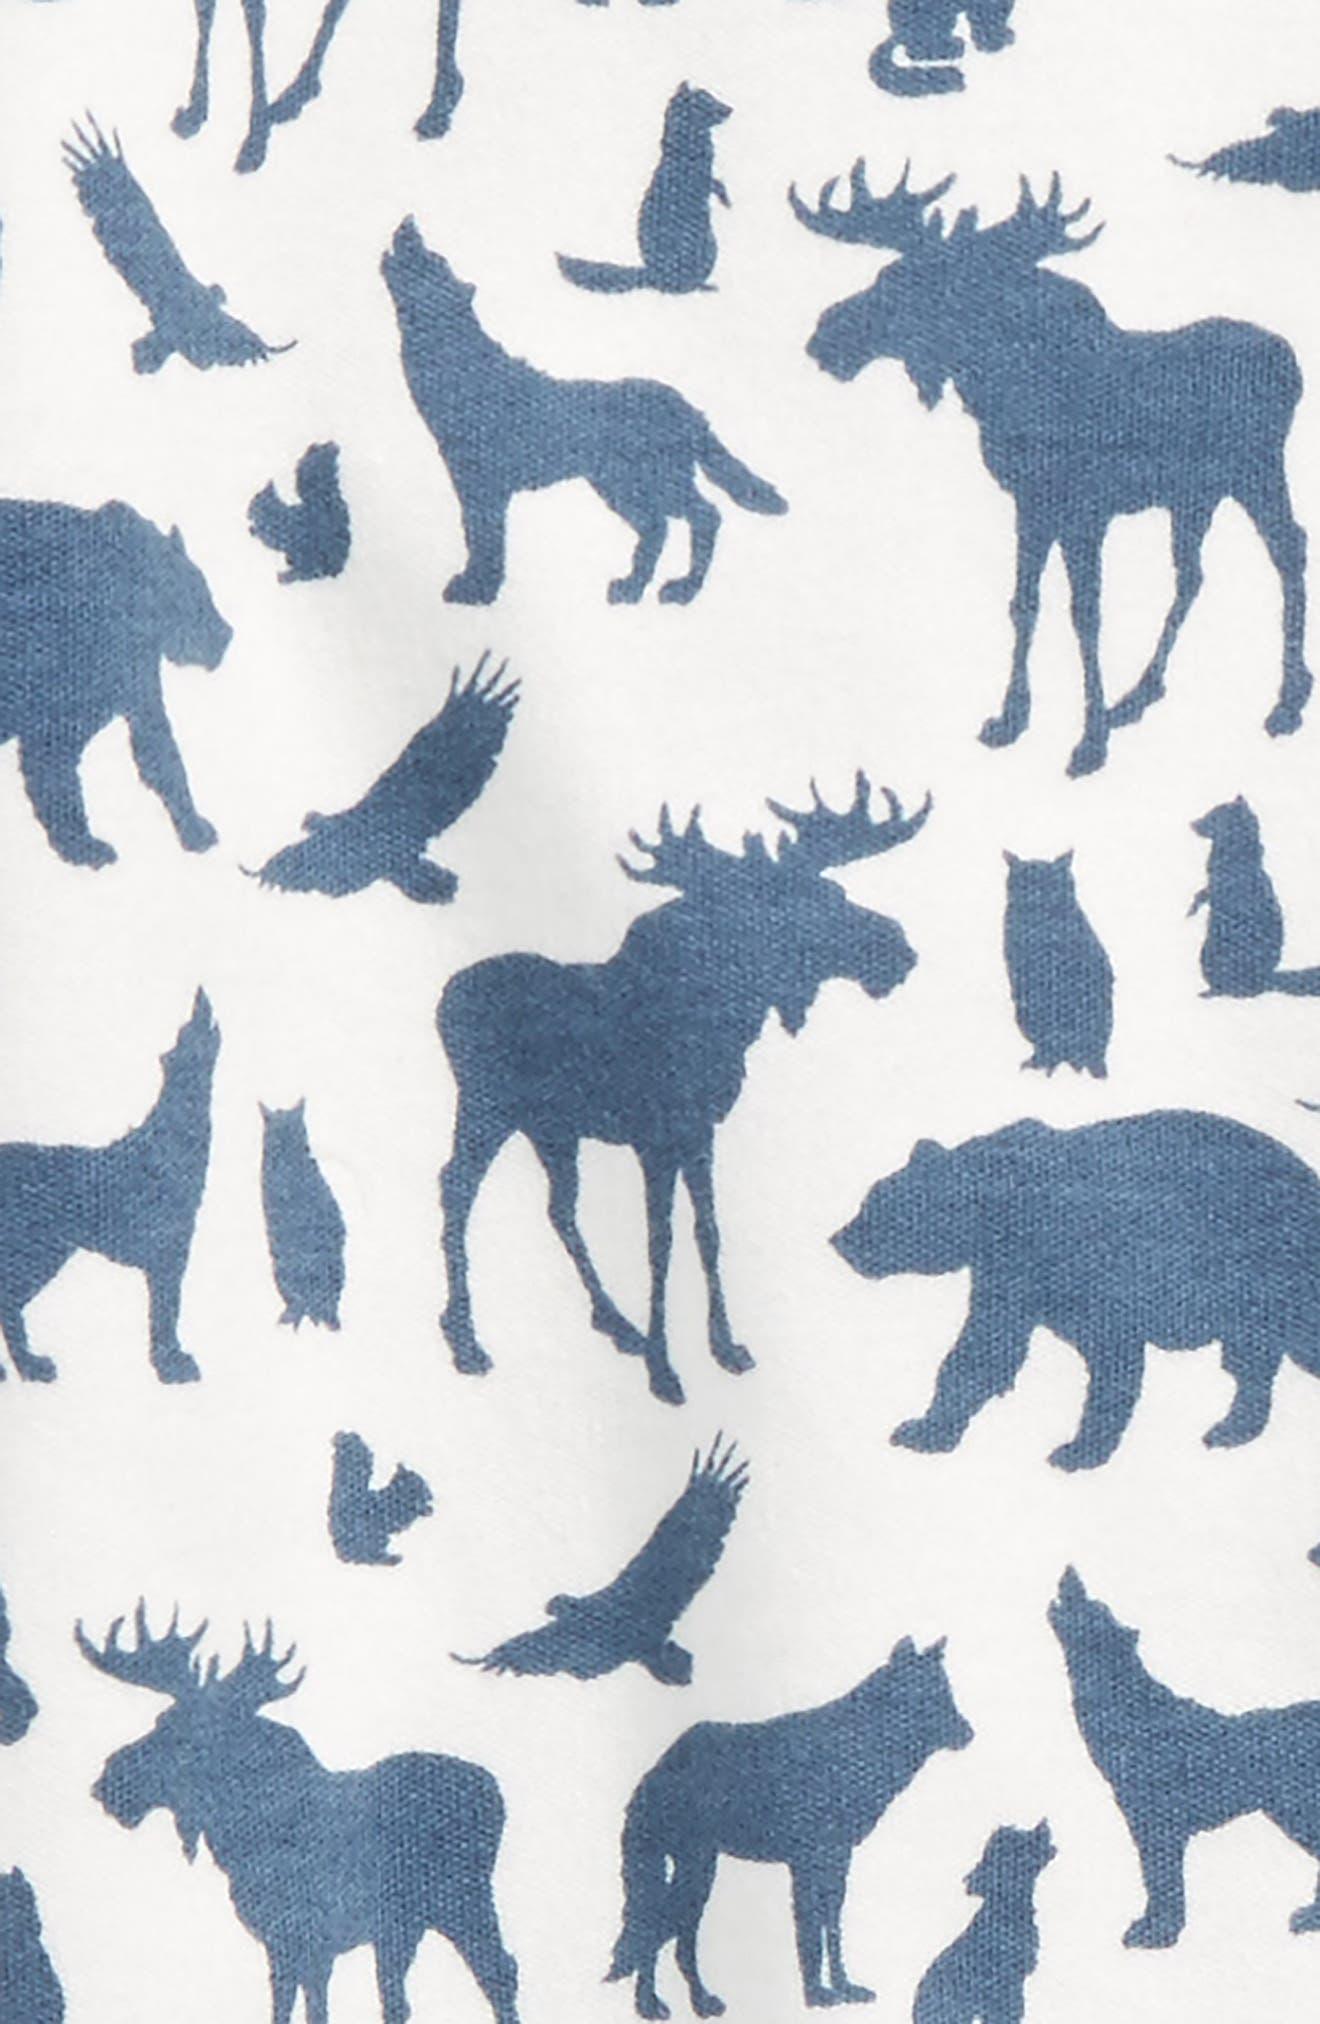 Animal Print Organic Cotton Footie,                             Alternate thumbnail 2, color,                             Off White / Blue